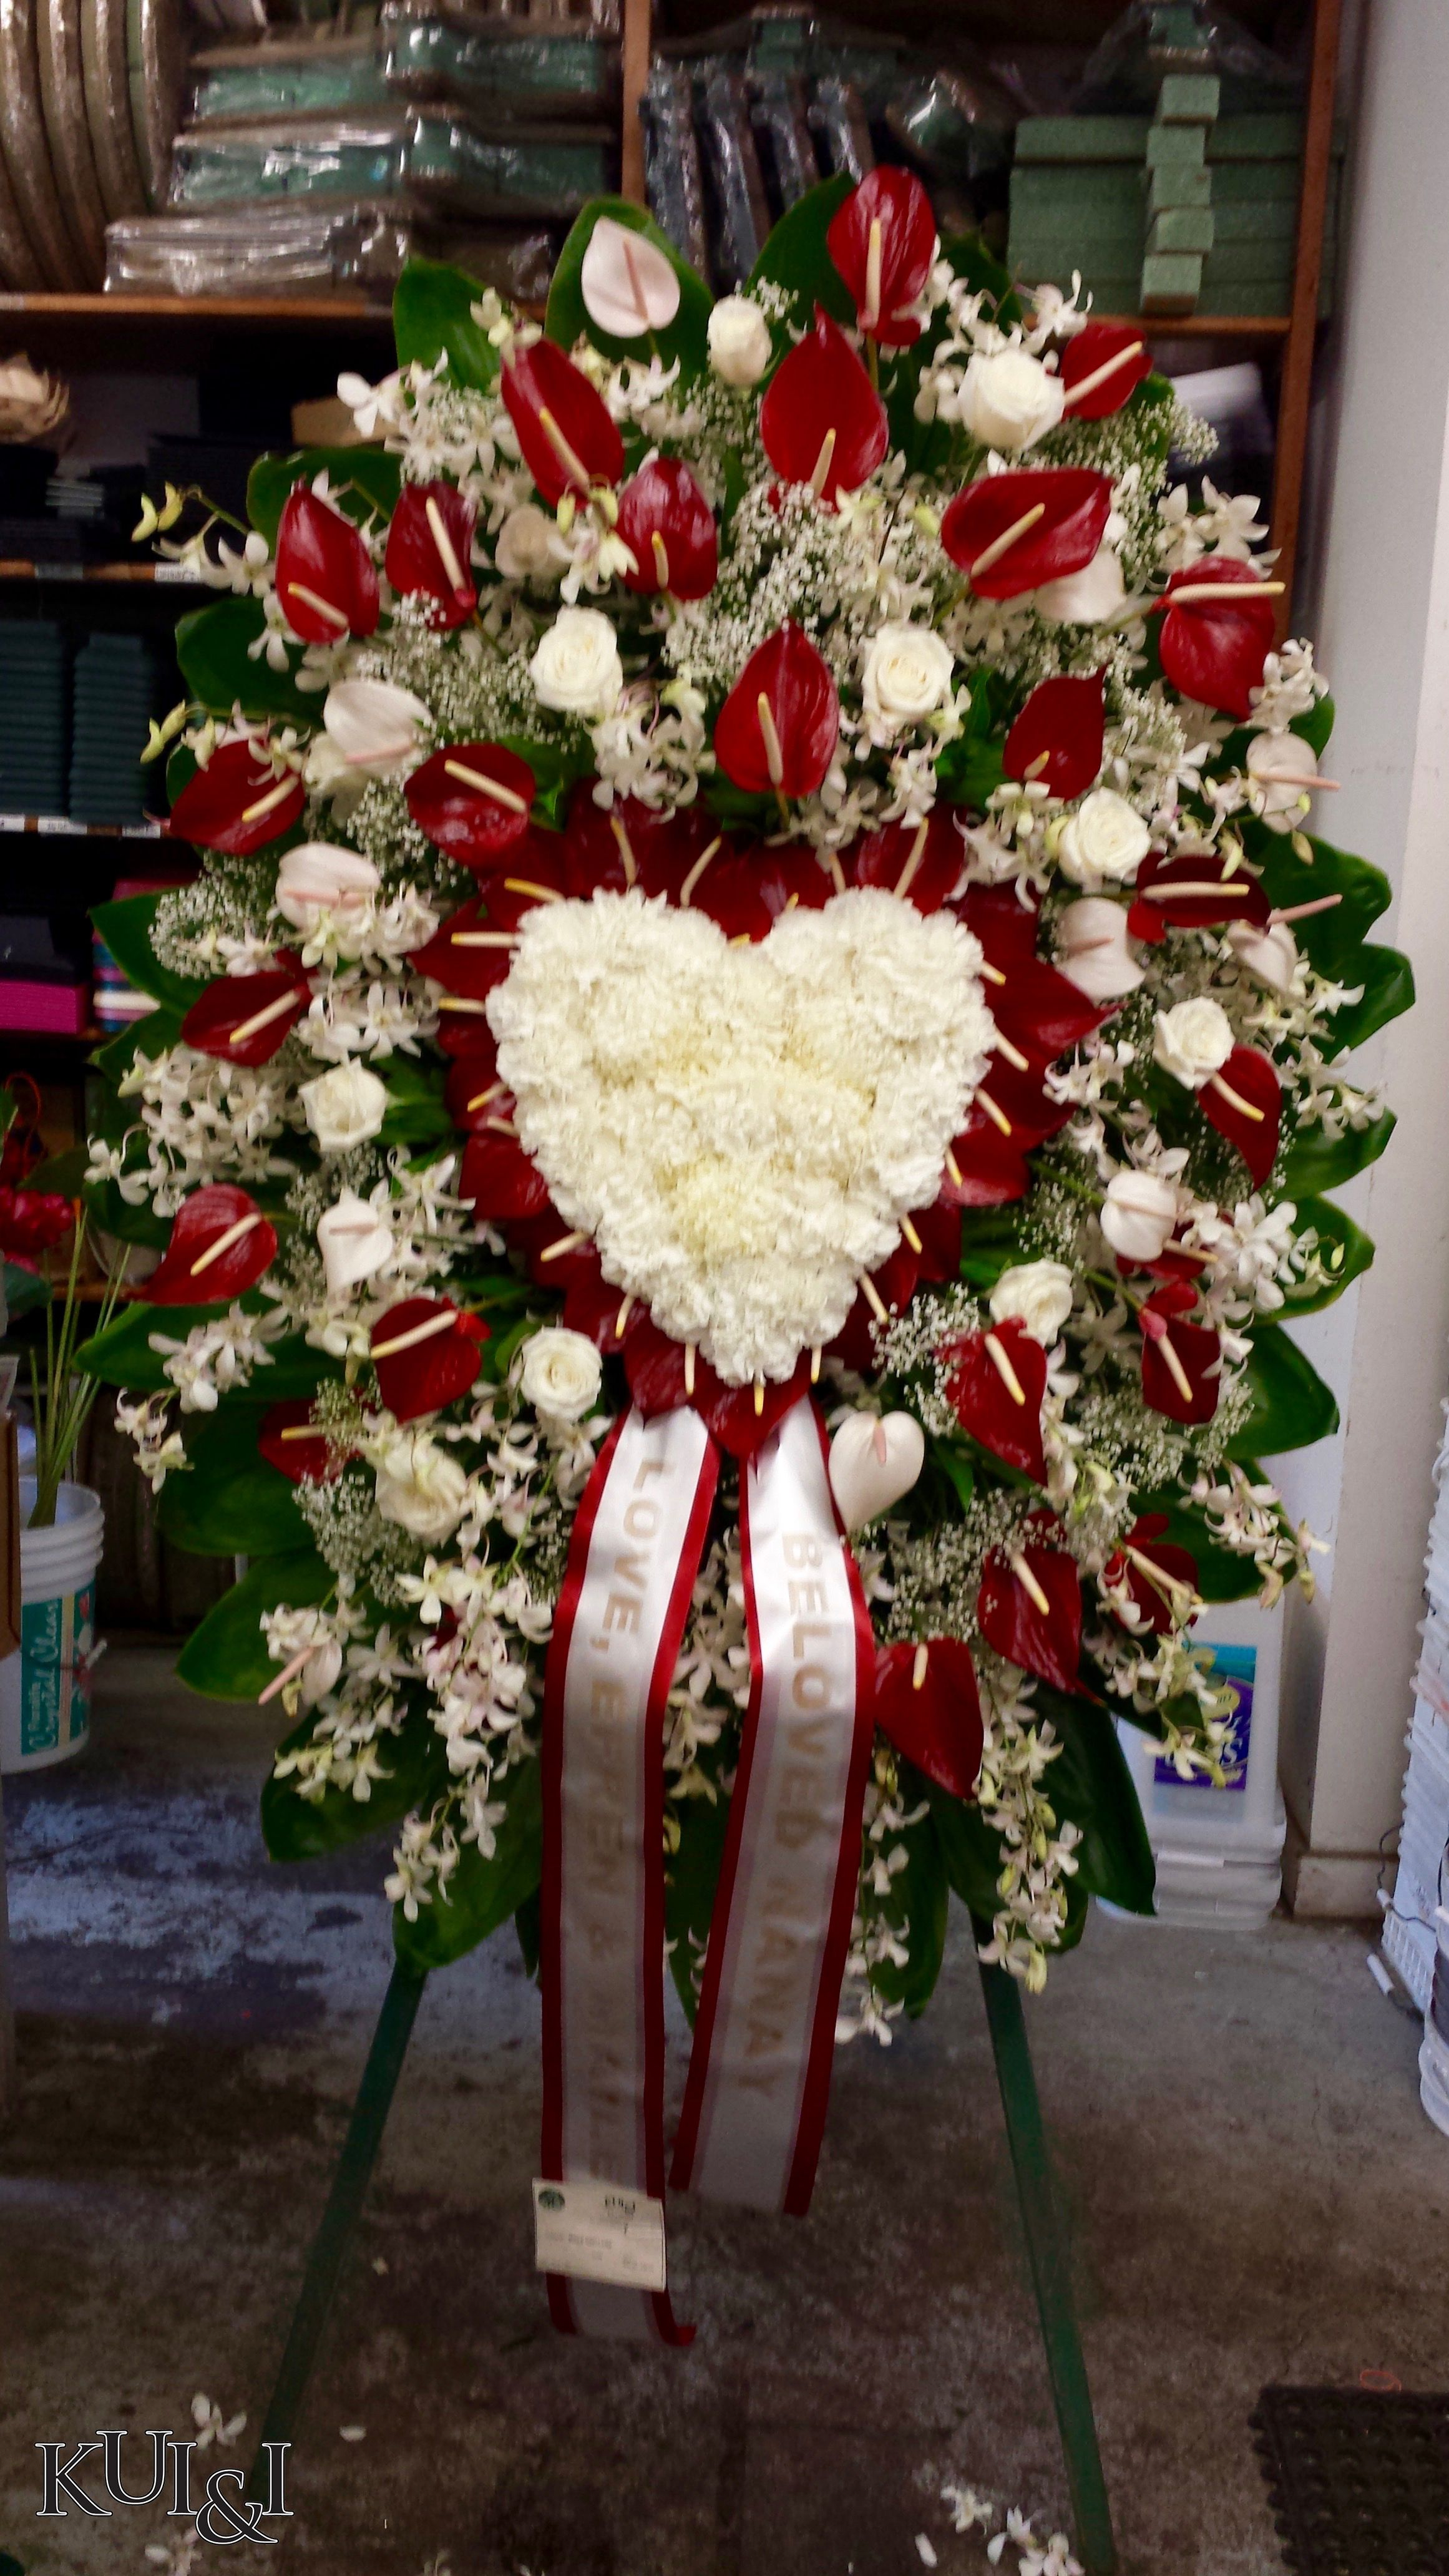 Heart standing spray kuiandiflorist sympathy flower heart standing spray kuiandiflorist casket flowers grave flowers cemetery flowers funeral izmirmasajfo